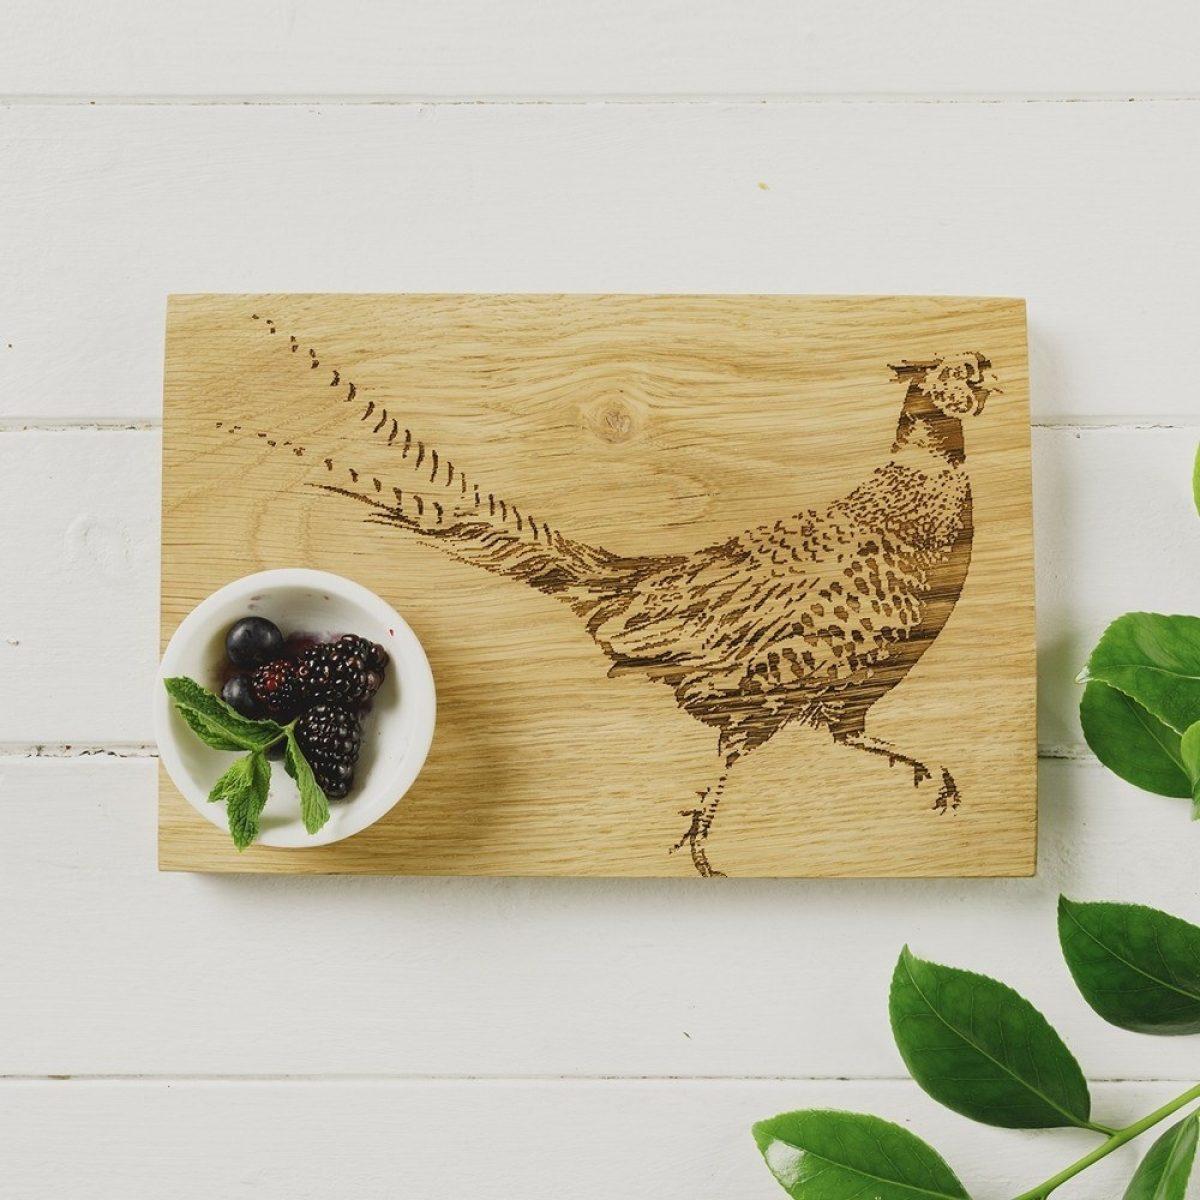 Jssosb30 pheasant oak serving board 30cm 1